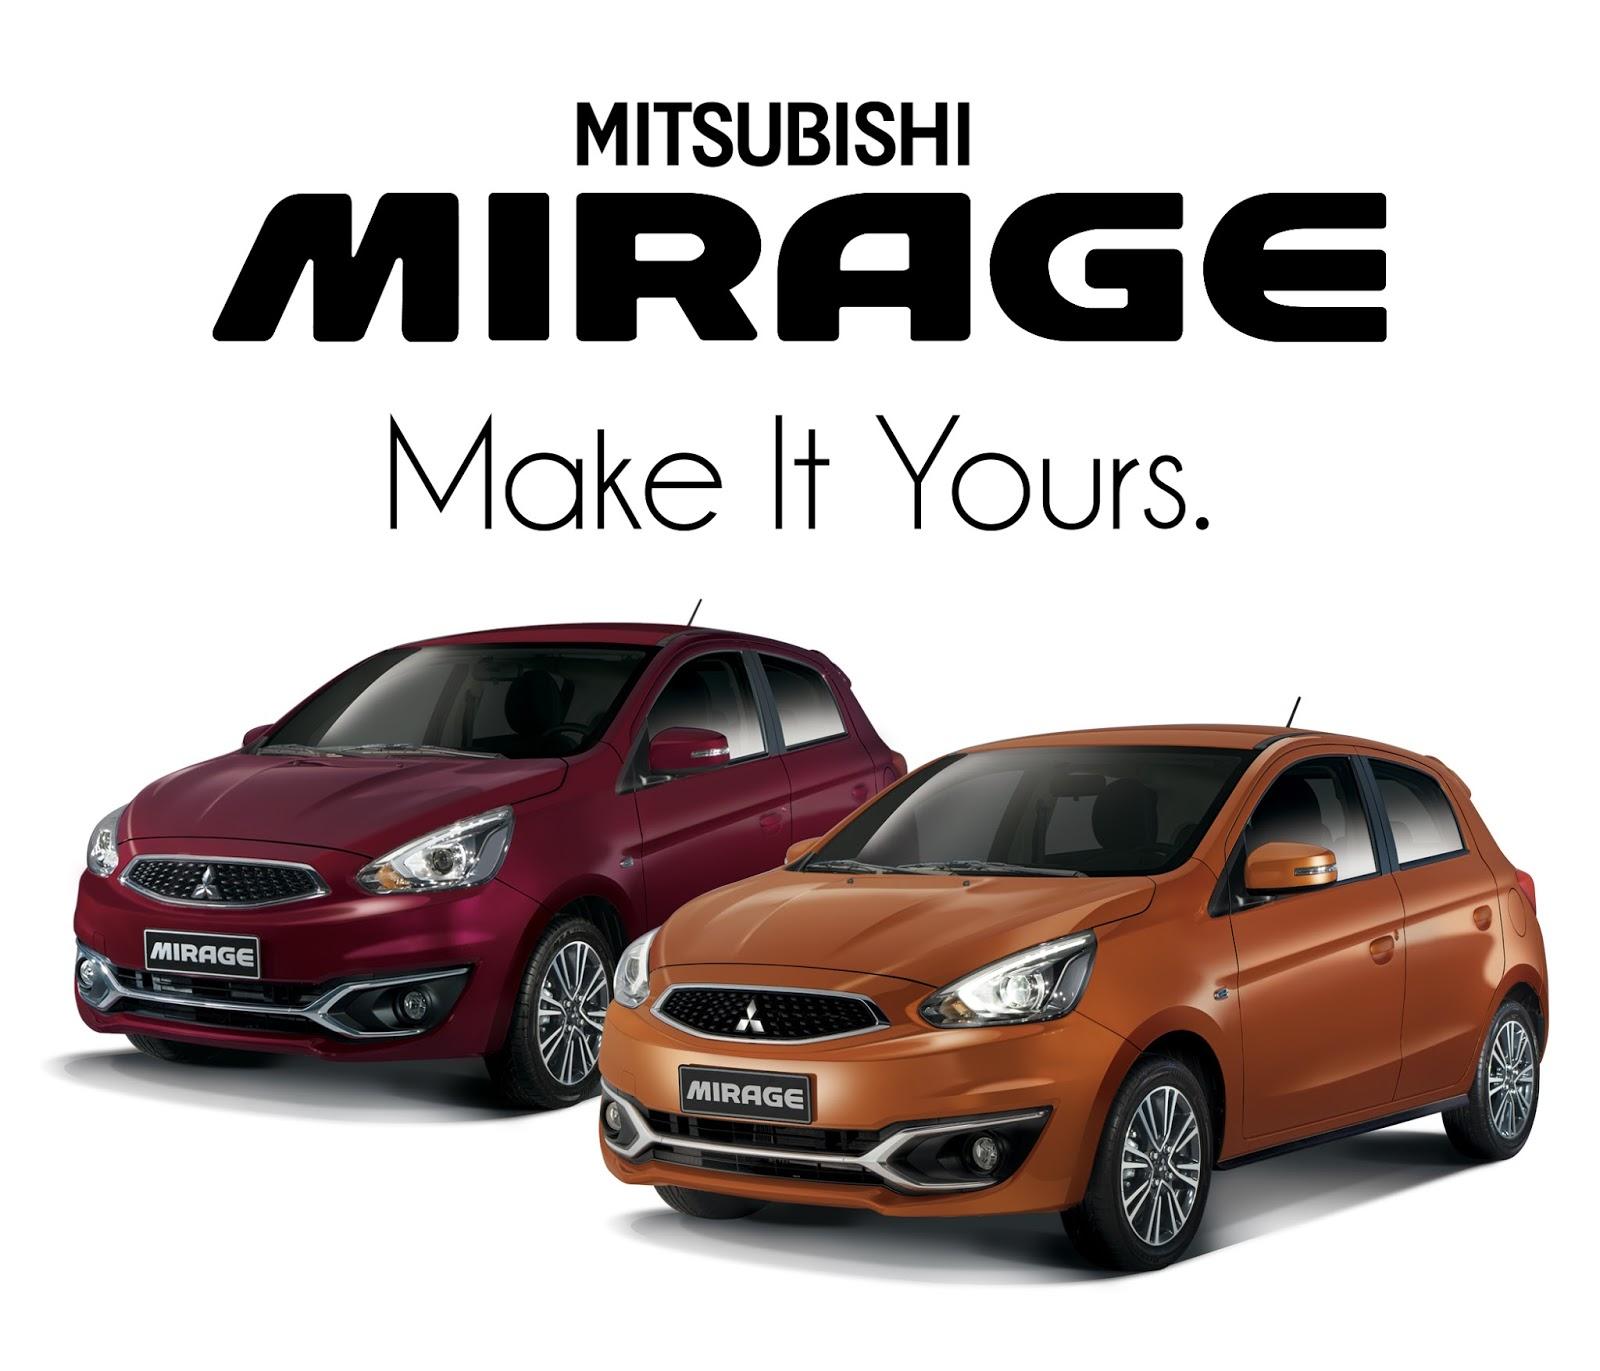 Mitsubishi Motors Philippines unveils the 2016 Mirage | Ilonggo Tech Blog